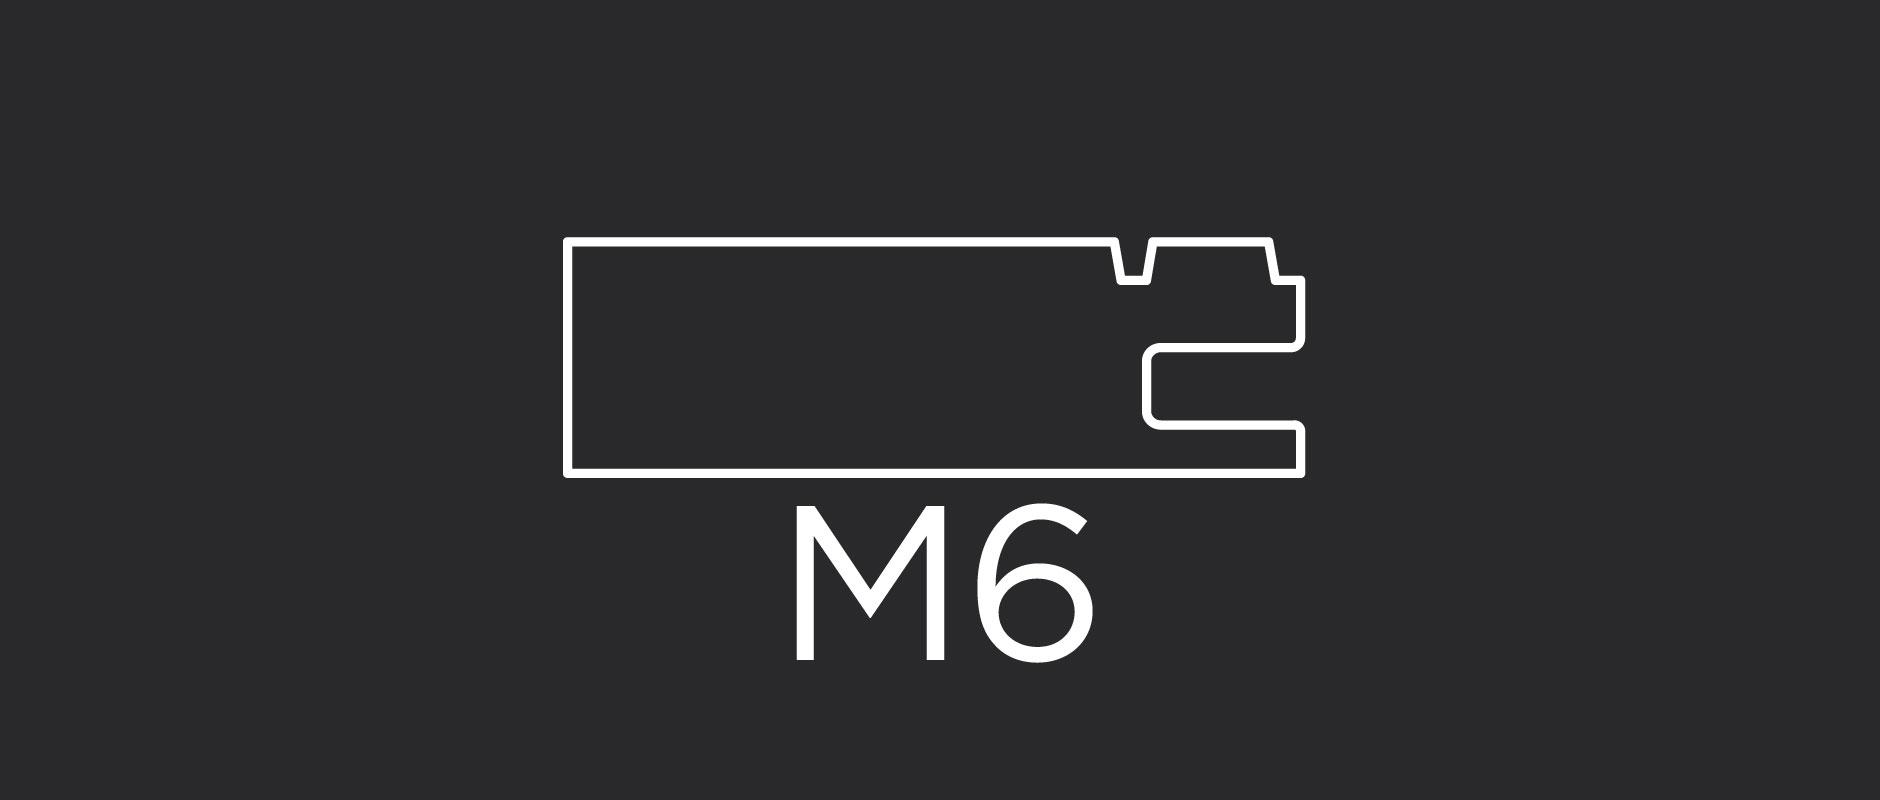 "M6 mitered door frame profile 2-3/8"" wide"